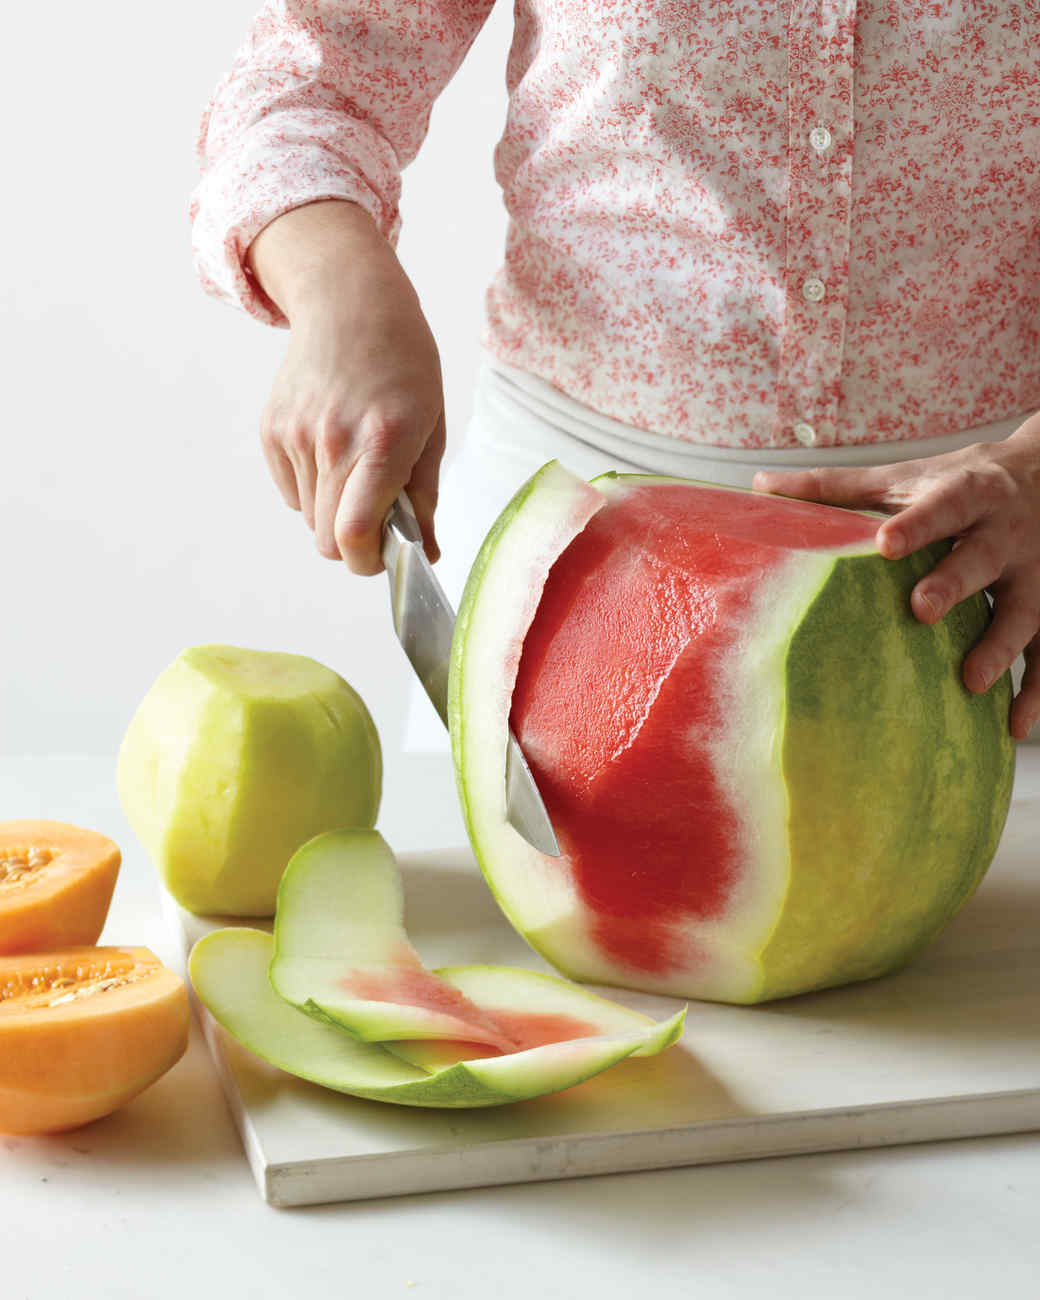 melons-0811mld107418.jpg